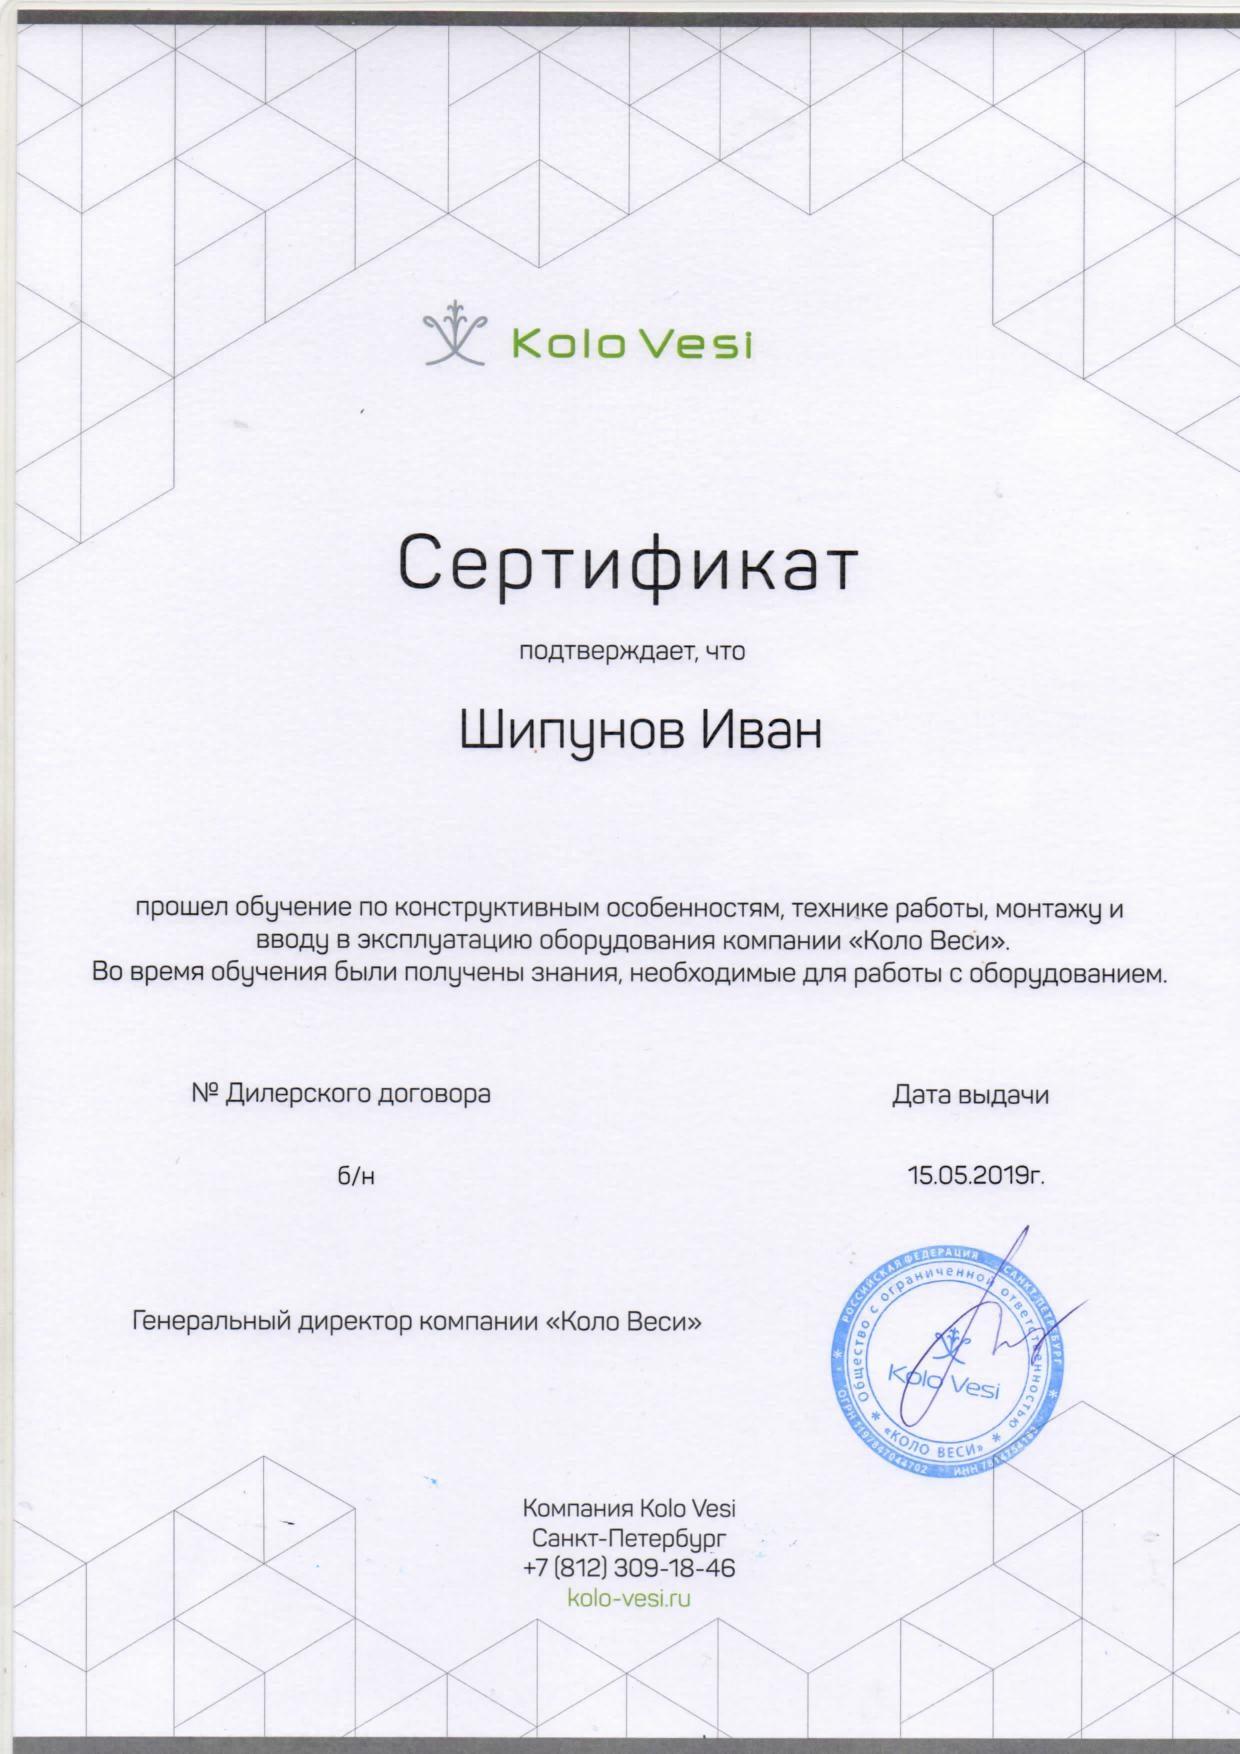 Сертификат Коло Веси (1)